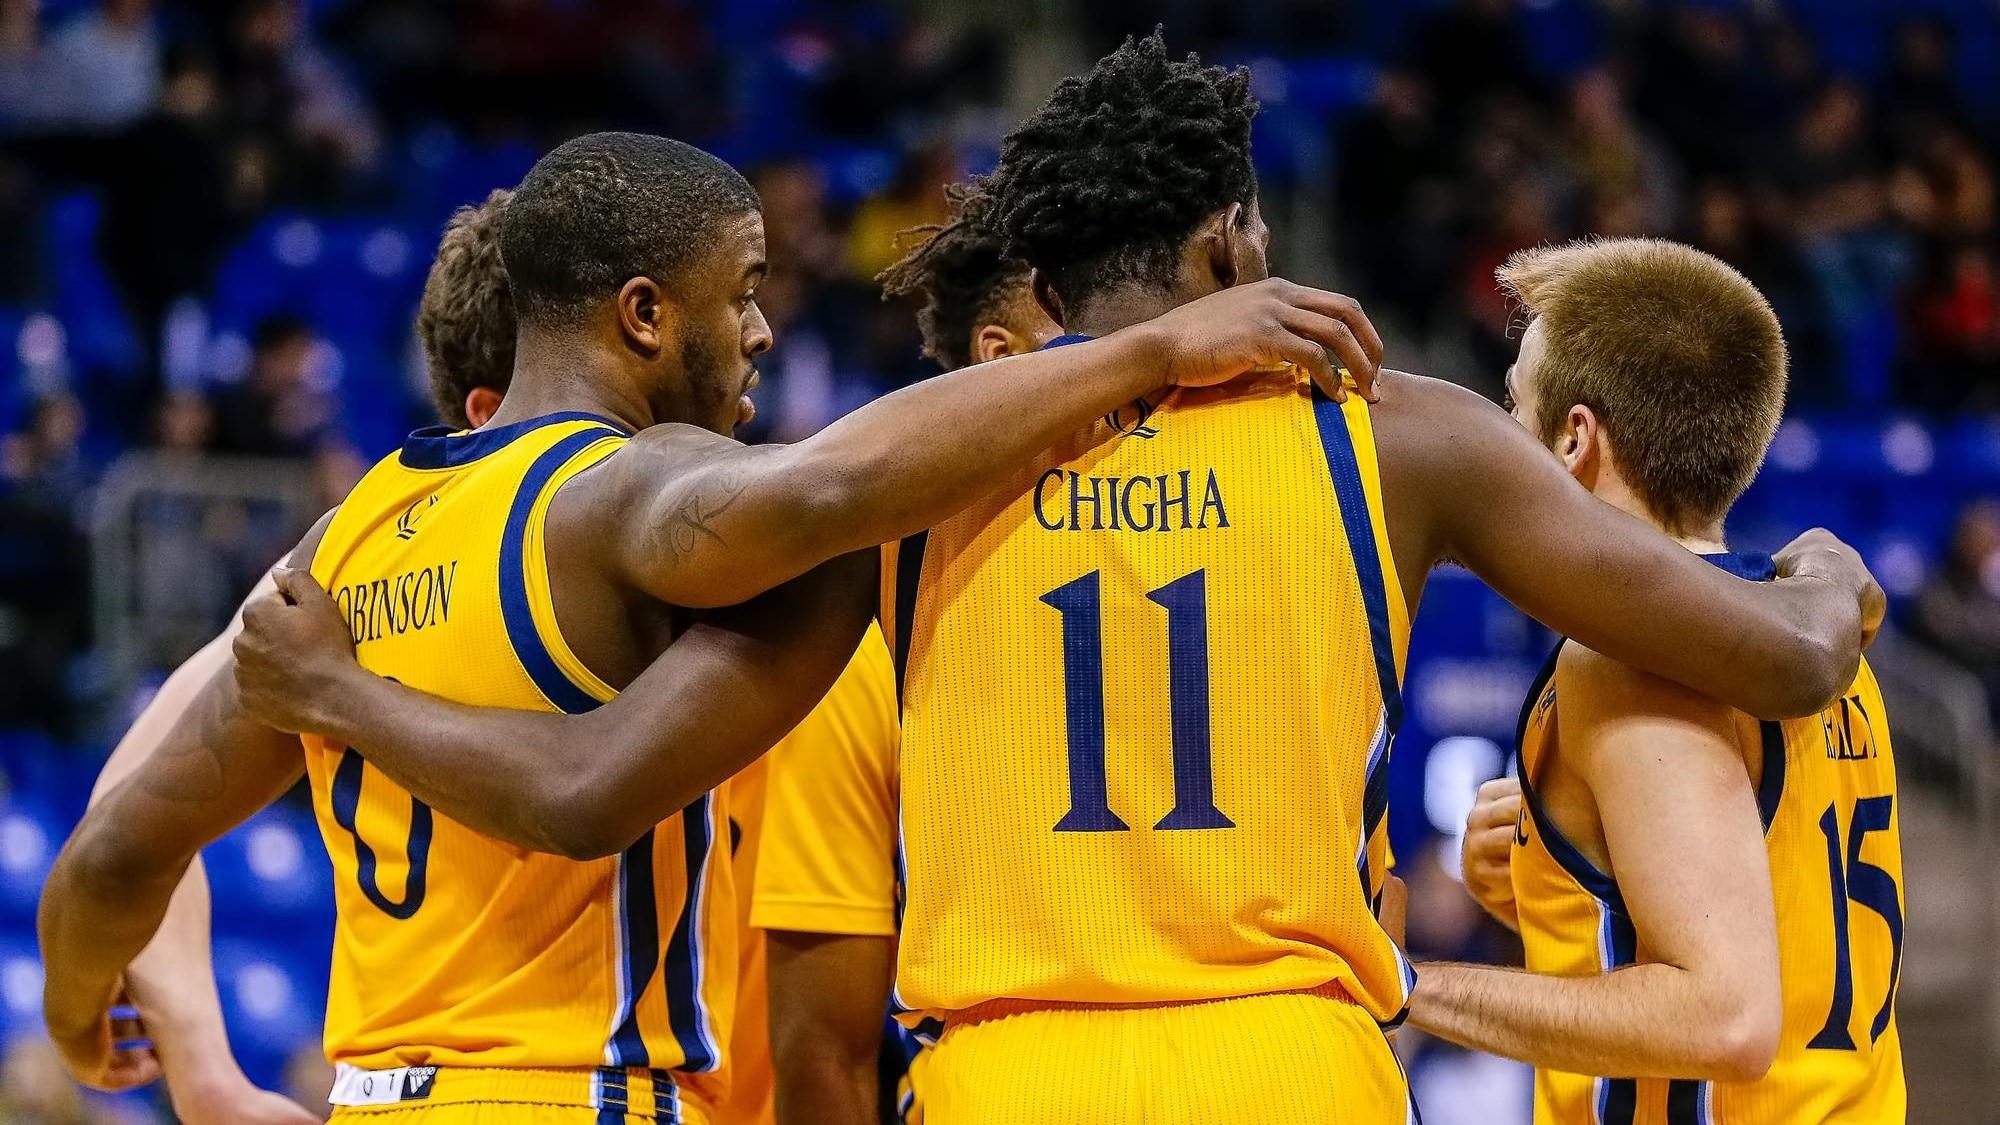 Quinnipiac basketball